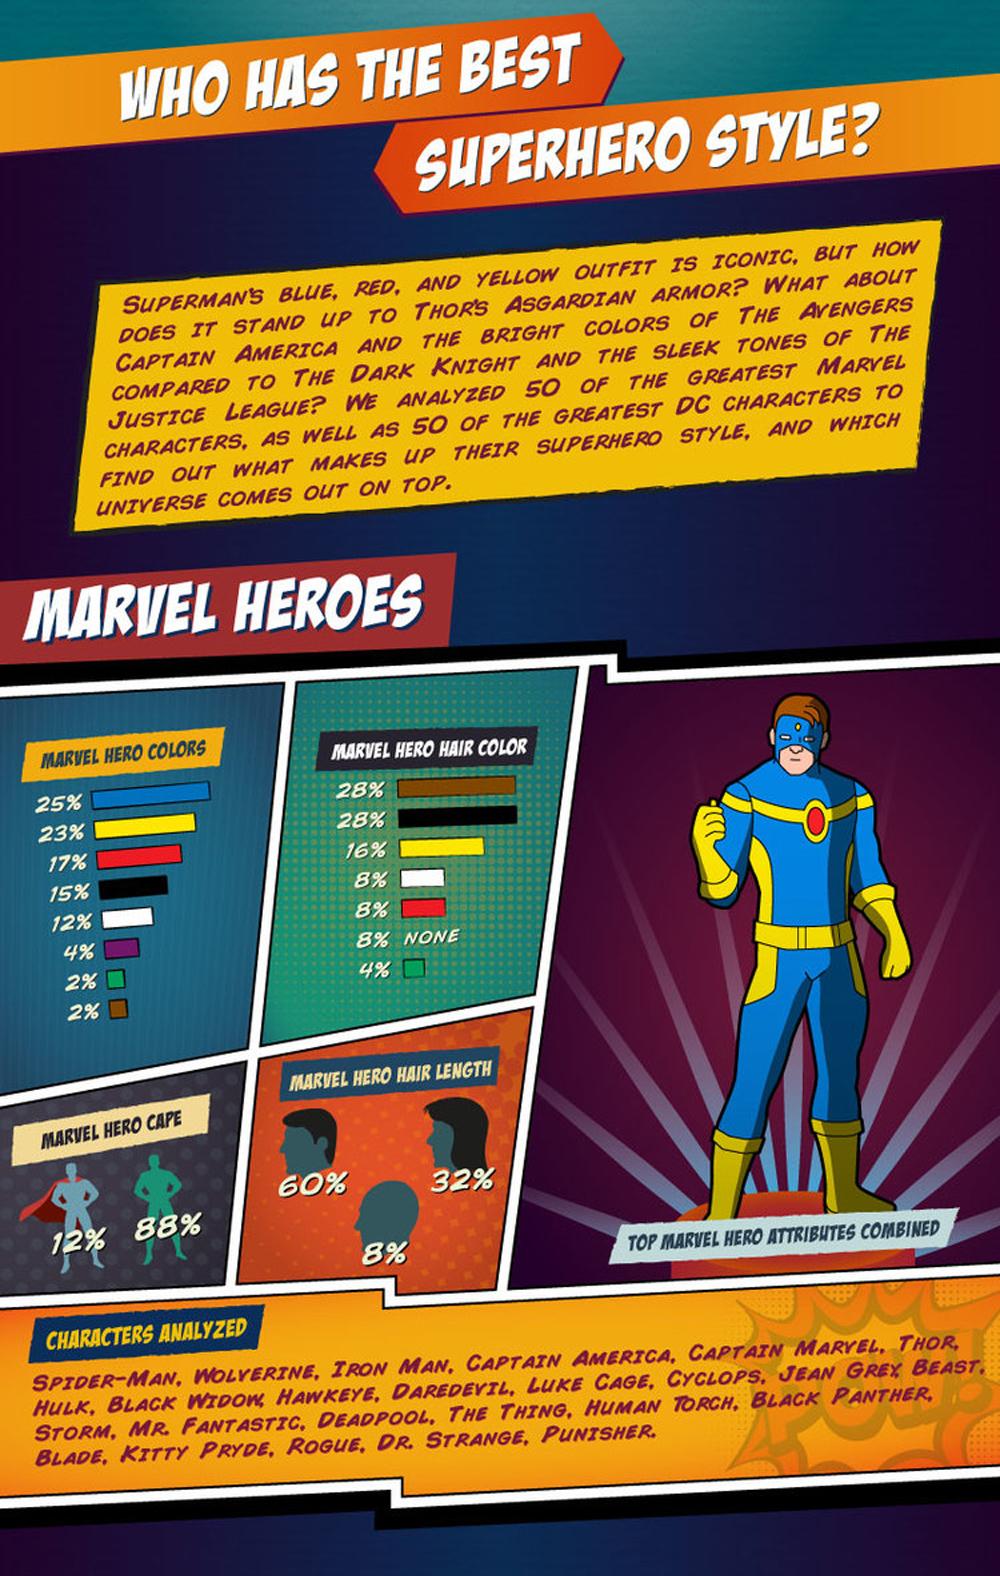 _Marvel-vs-DC_IMage-Part-1_BBBuzz